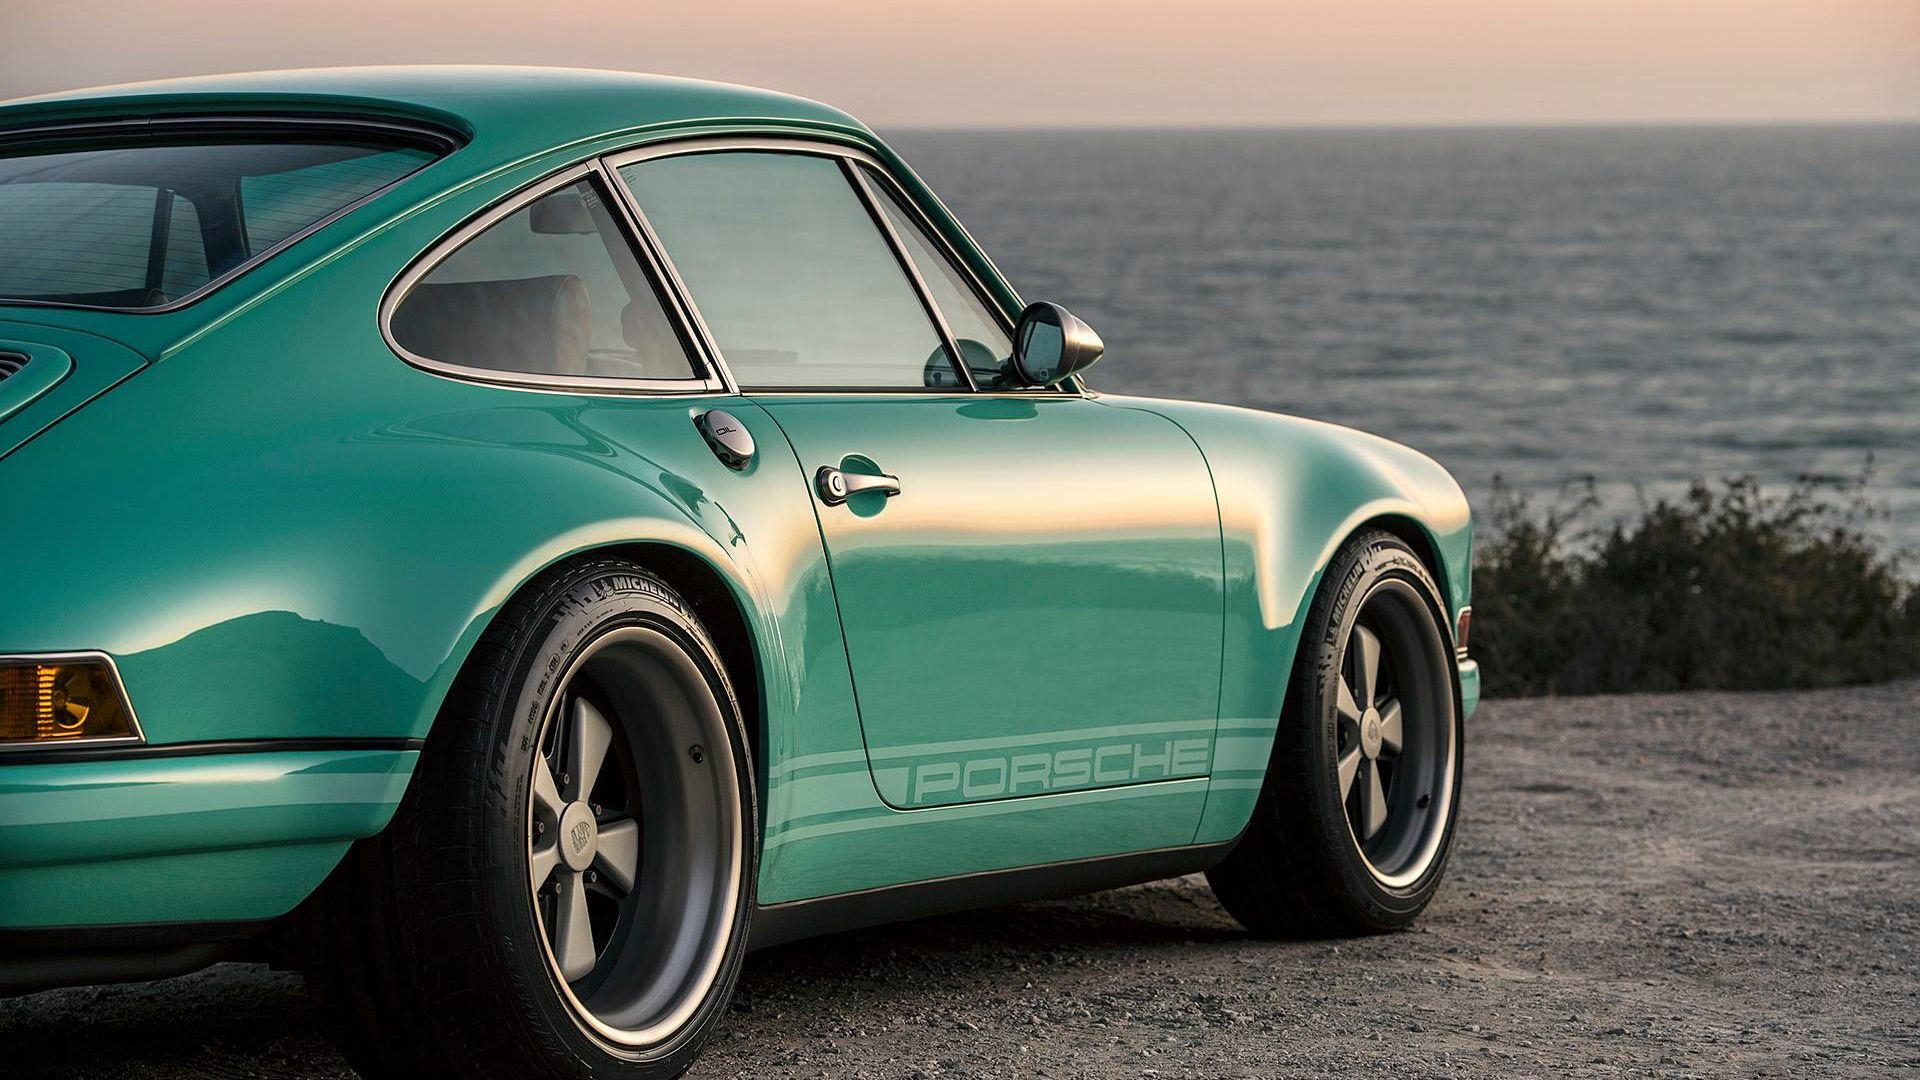 This Mouthwatering Custom Porsche Stuns In Seafoam Green Custom Porsche Singer Vehicle Design Porsche